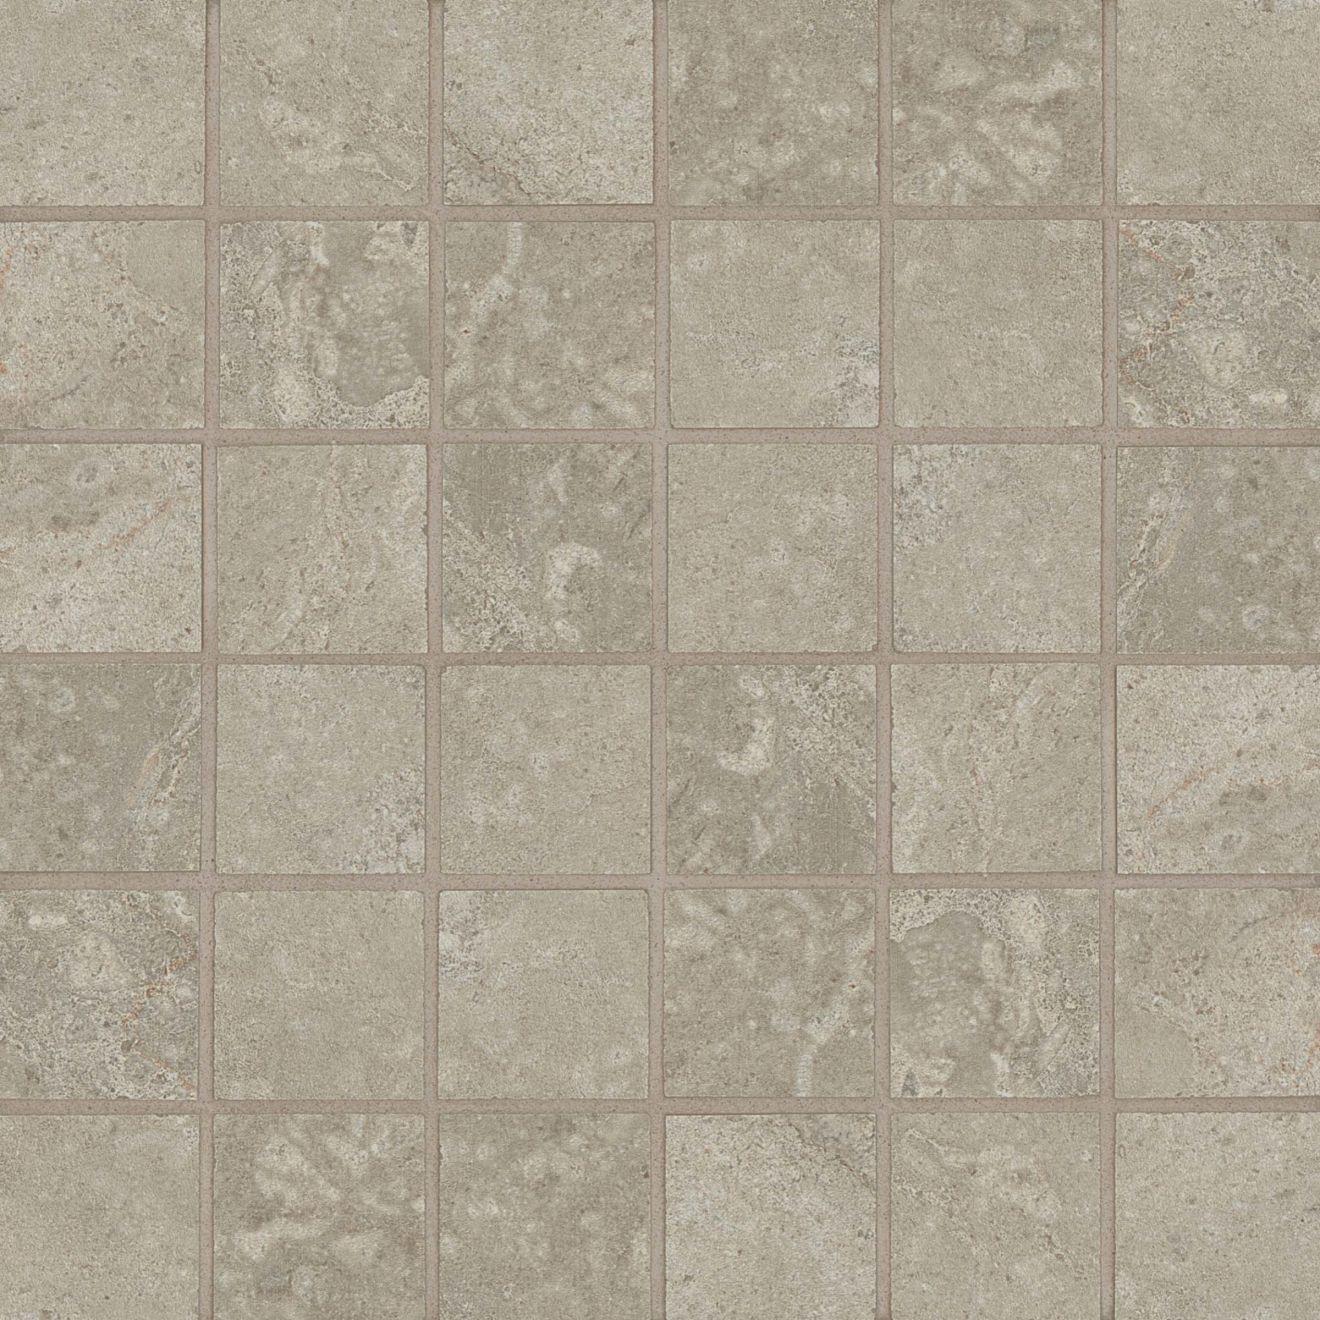 "Stone Valley 2"" x 2"" Floor & Wall Mosaic in Sabbia"